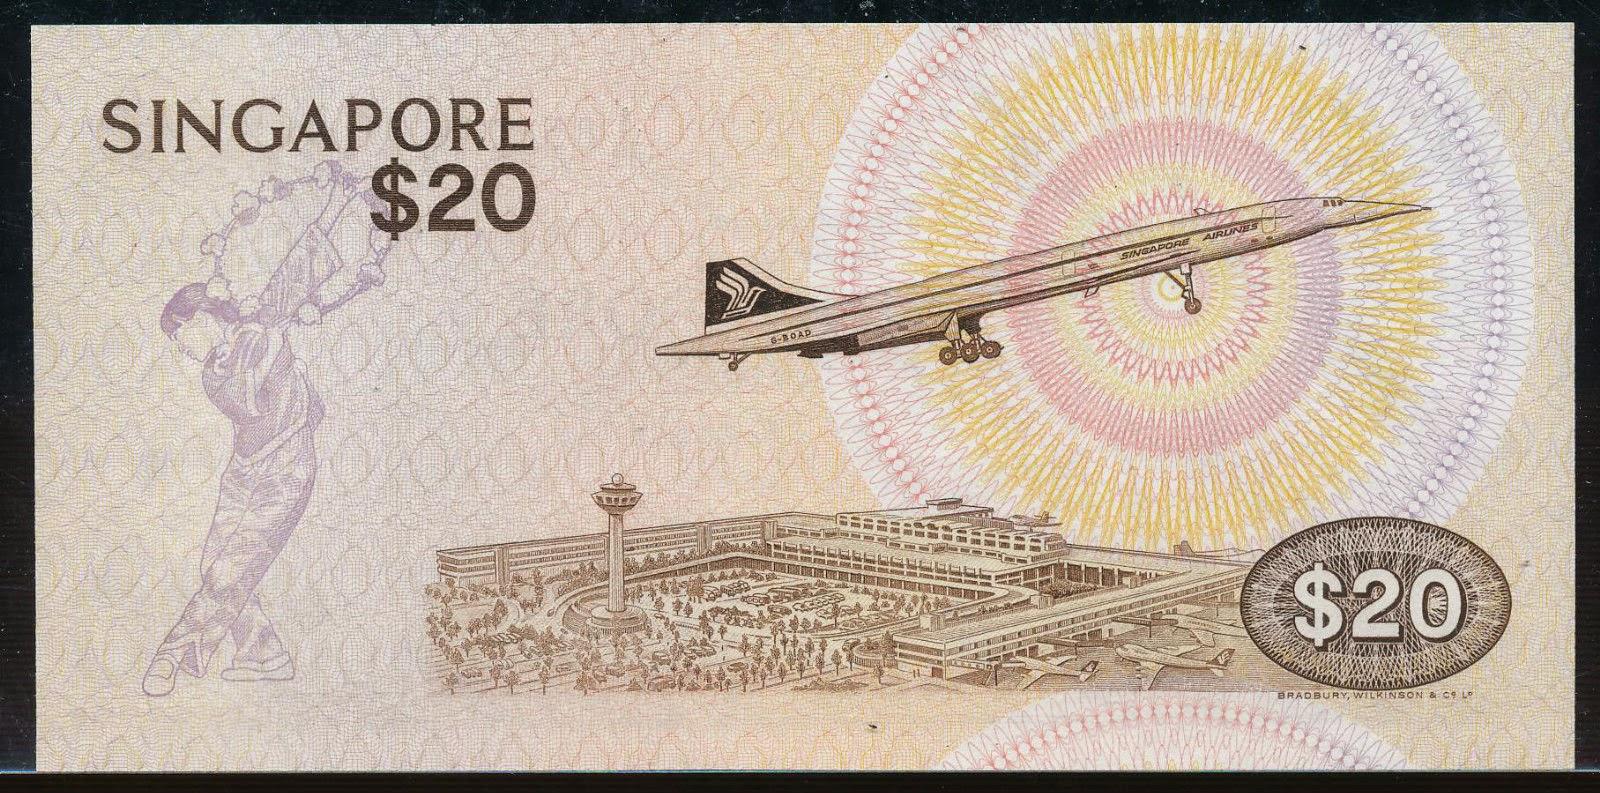 Singapore 20 Dollar note Airport Concorde